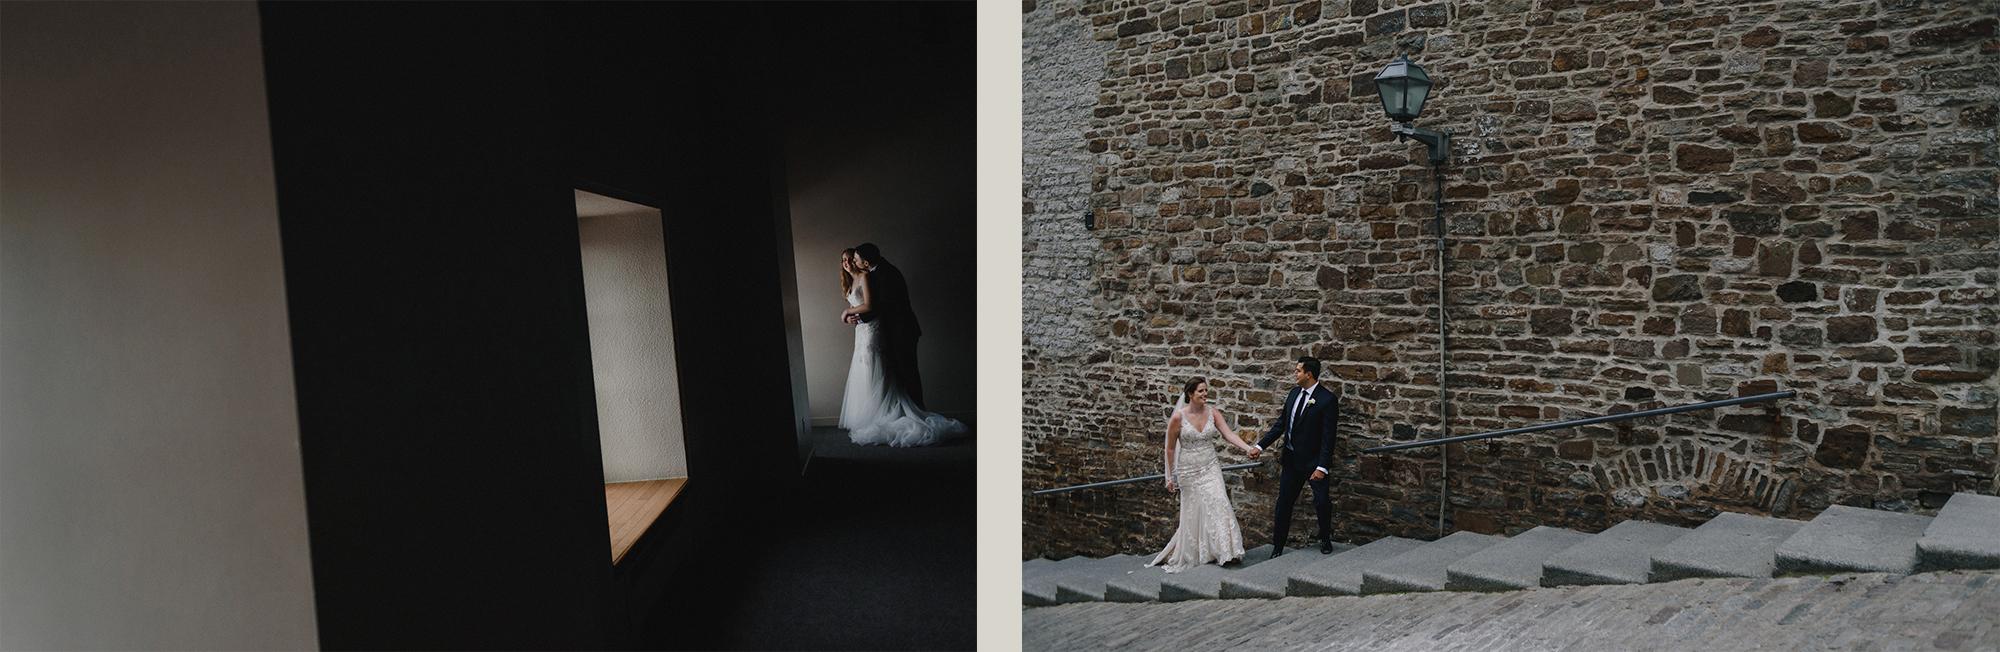 auguste_mariage_wedding_montreal_04.JPG